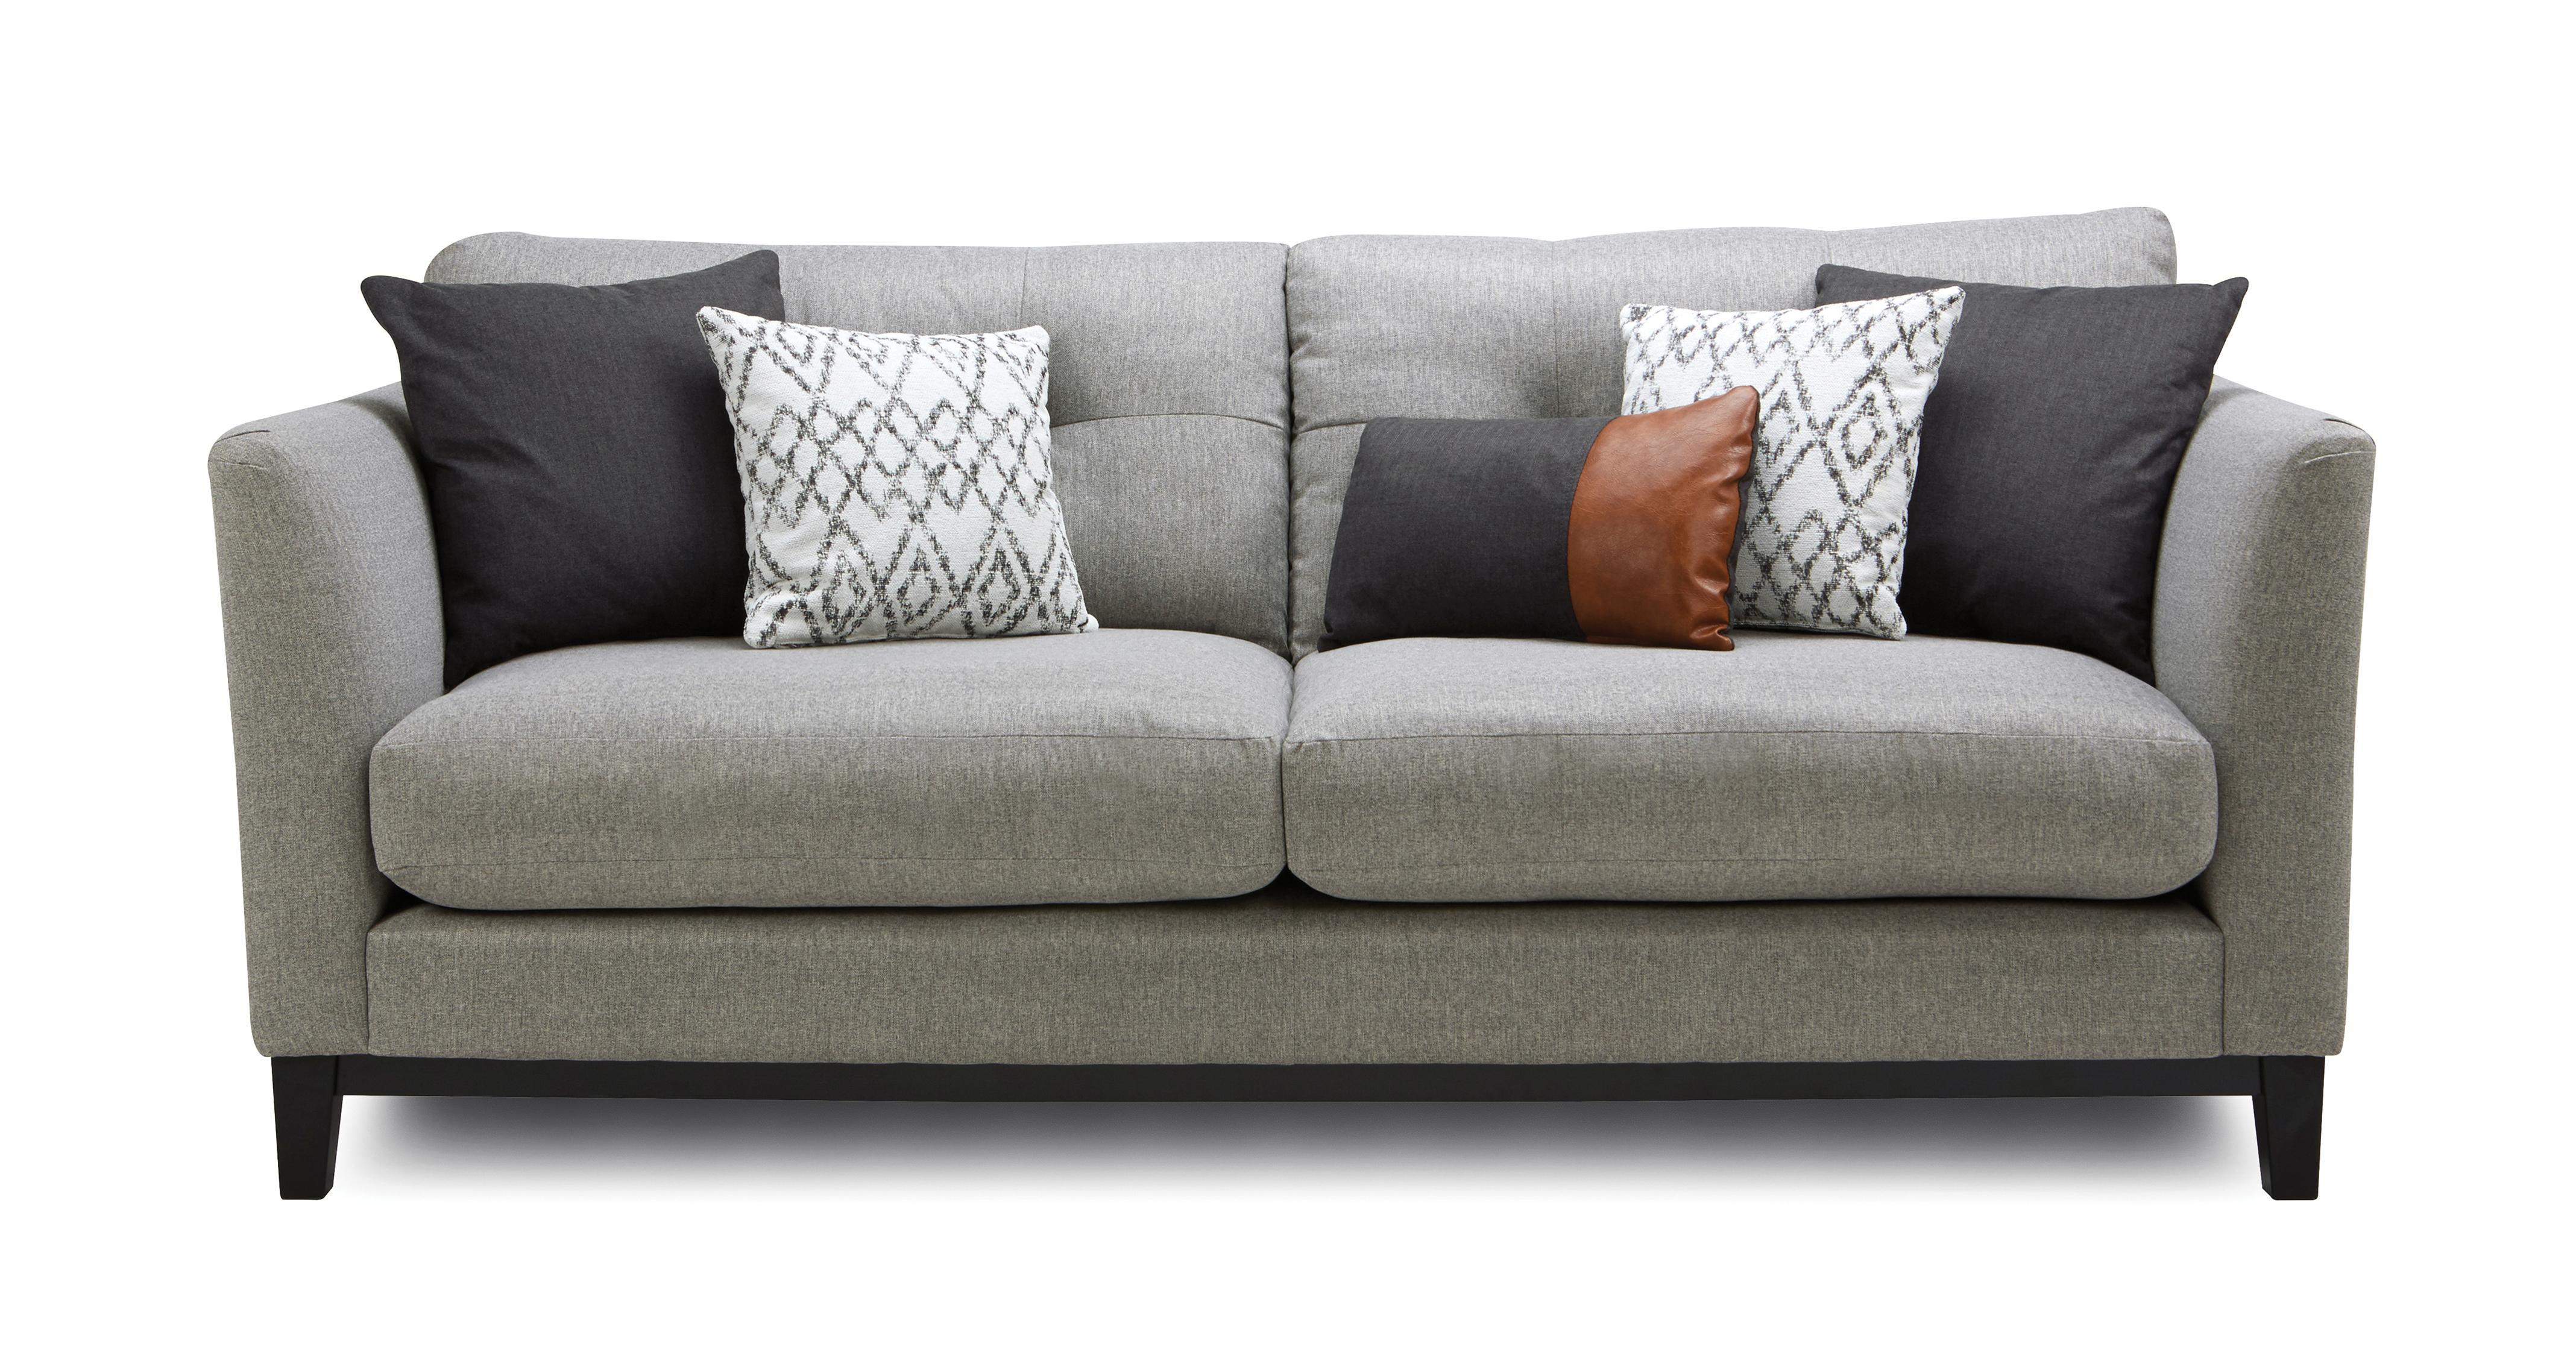 elva 4 seater sofa dfs. Black Bedroom Furniture Sets. Home Design Ideas